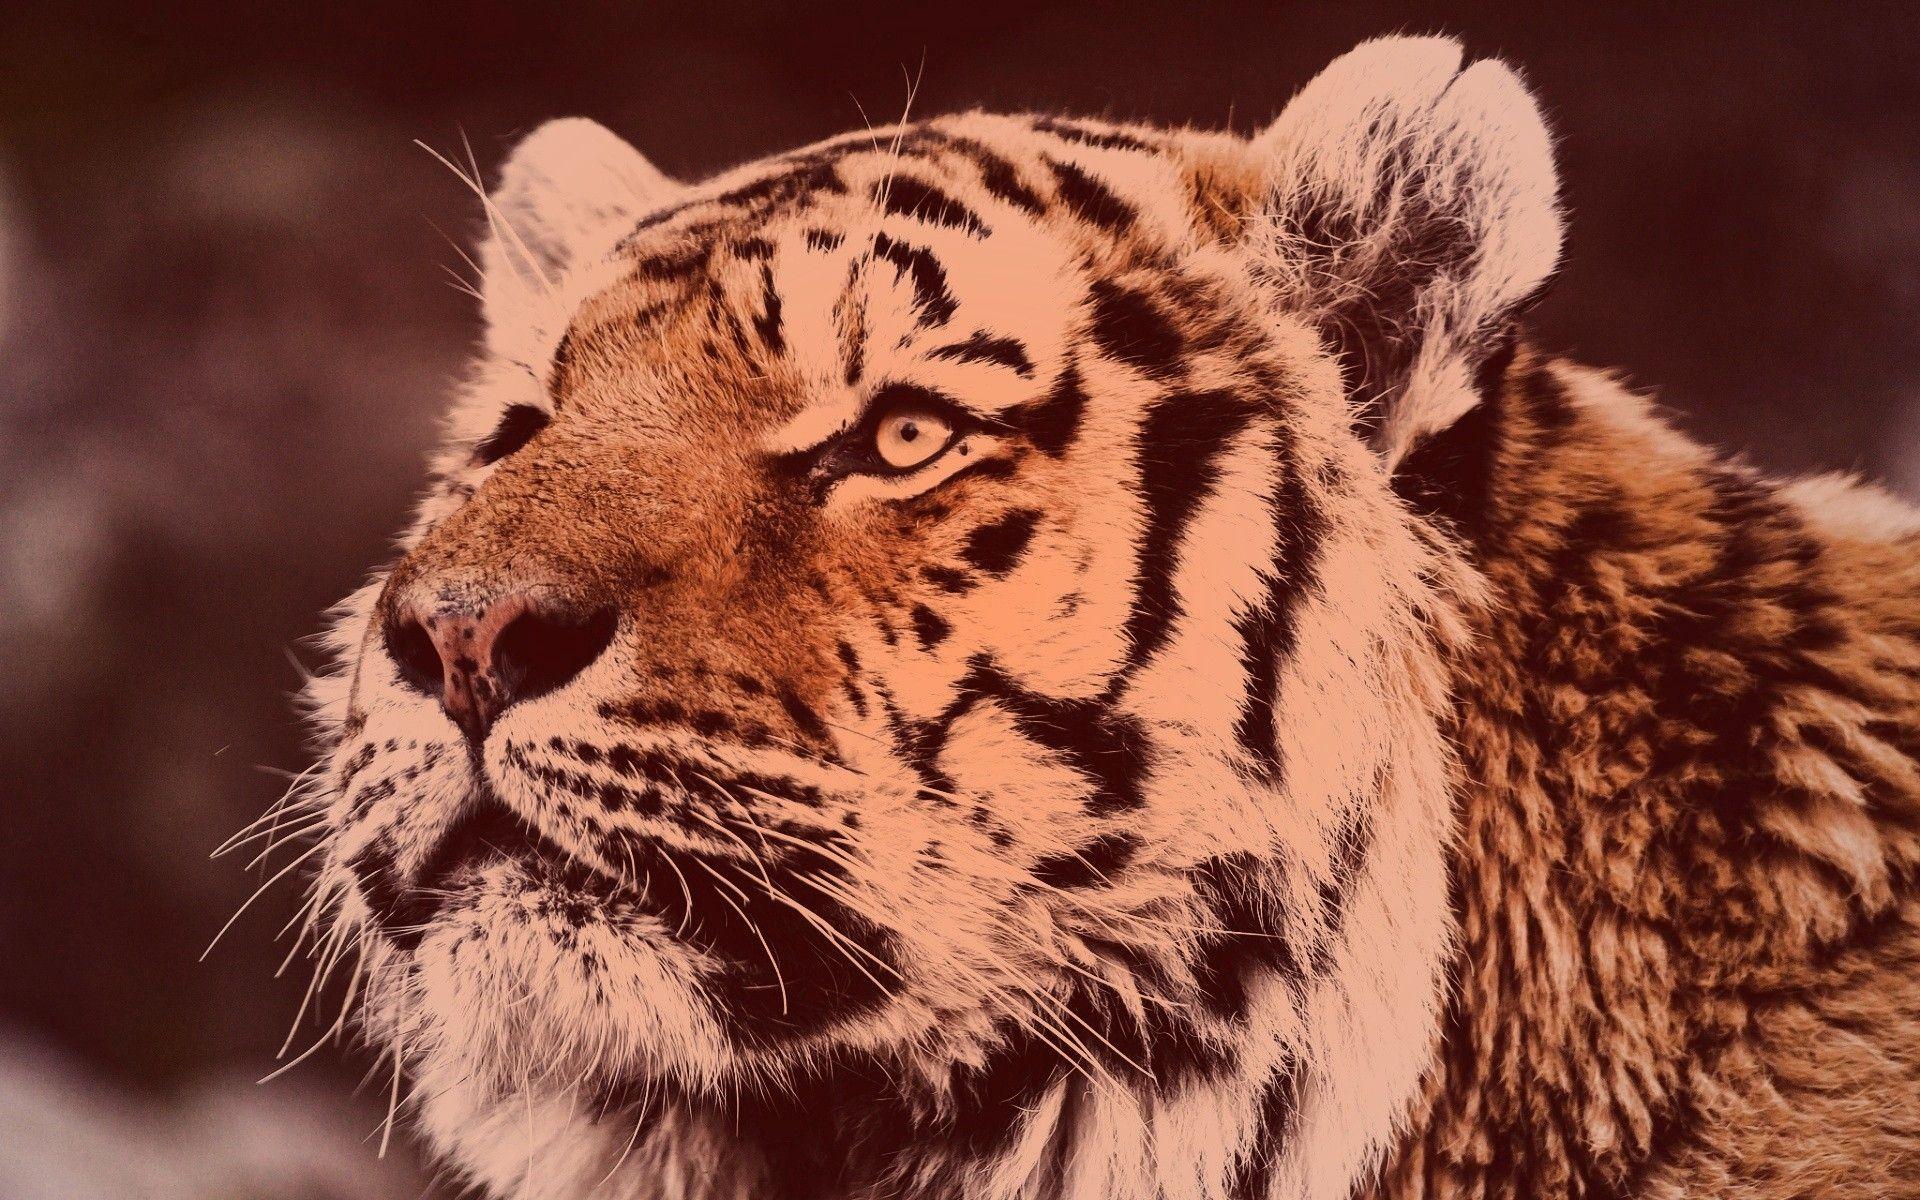 Tiger, Good Wallpaper